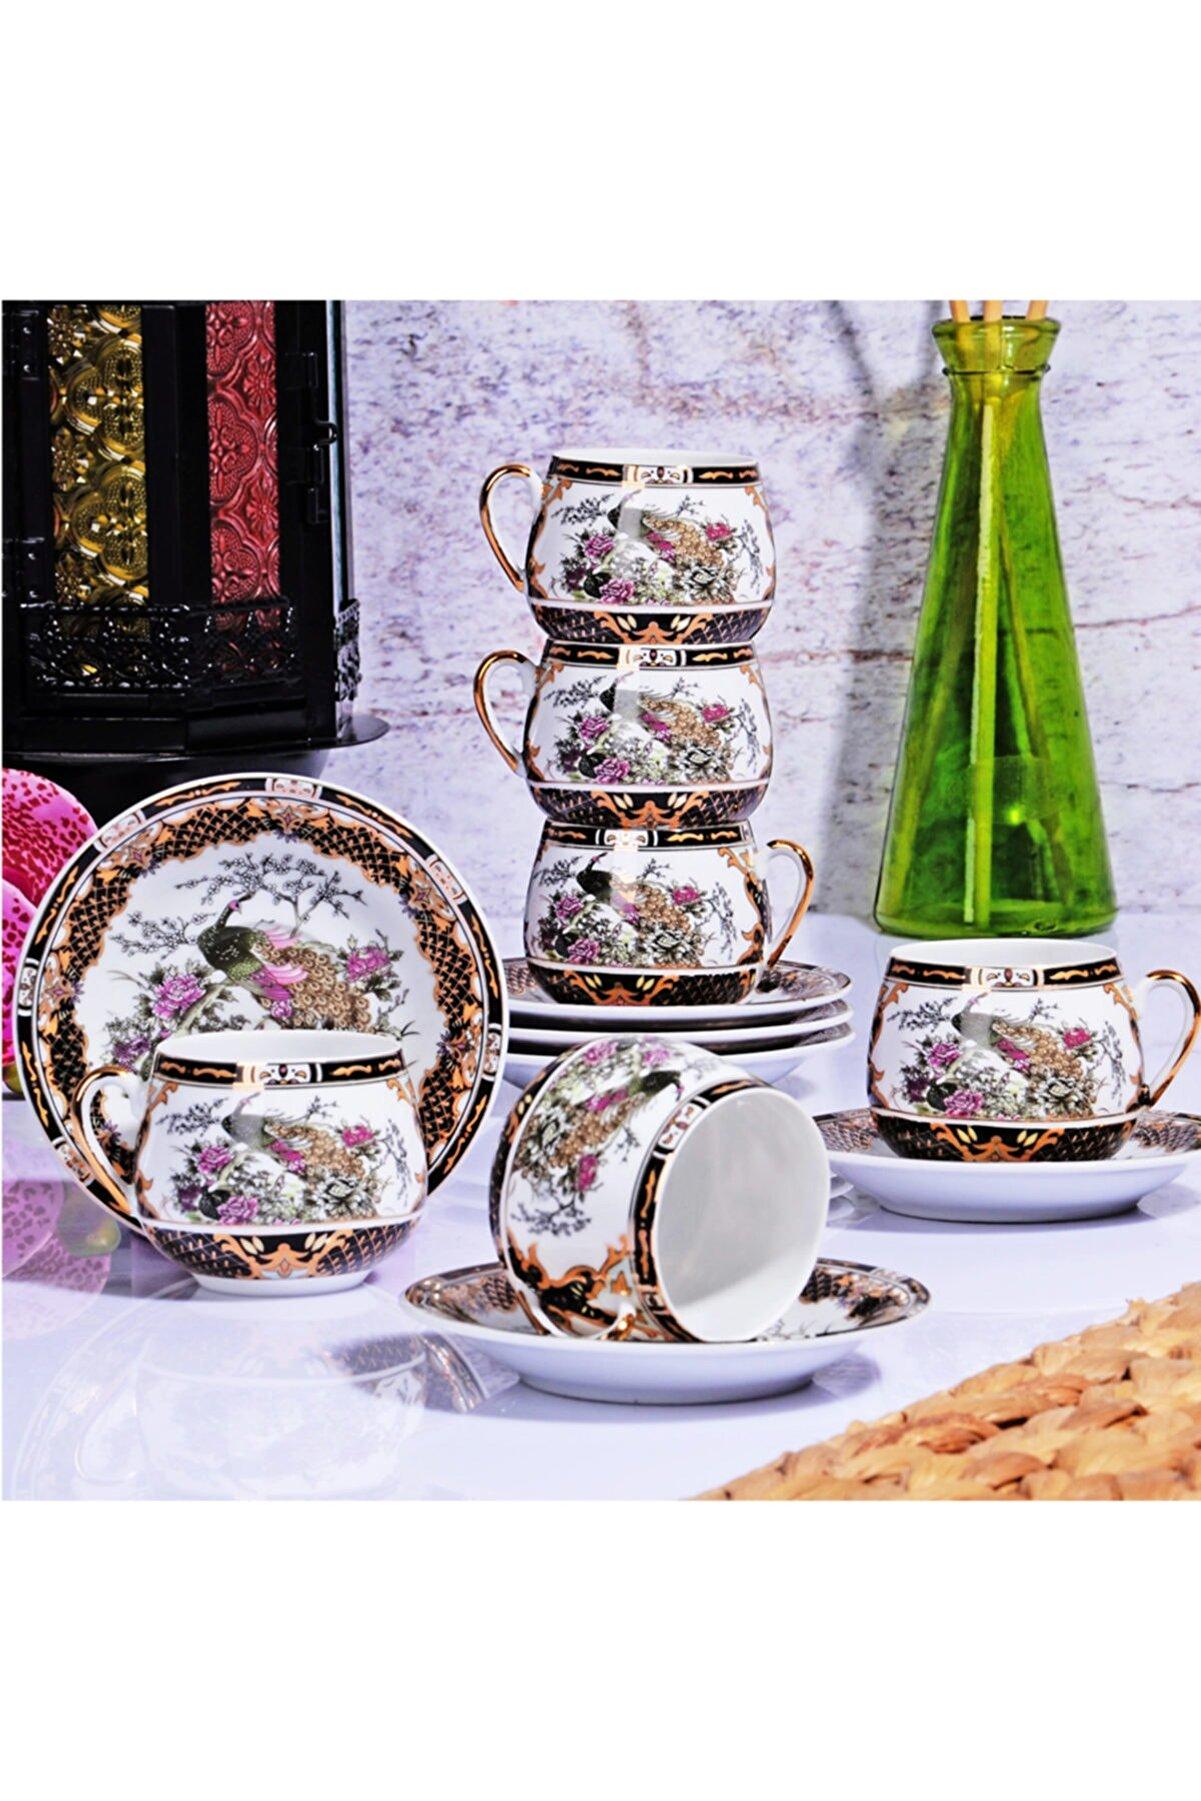 Kitchen World Porselen 6lı Tombul Fincan Takımı Gsa-51